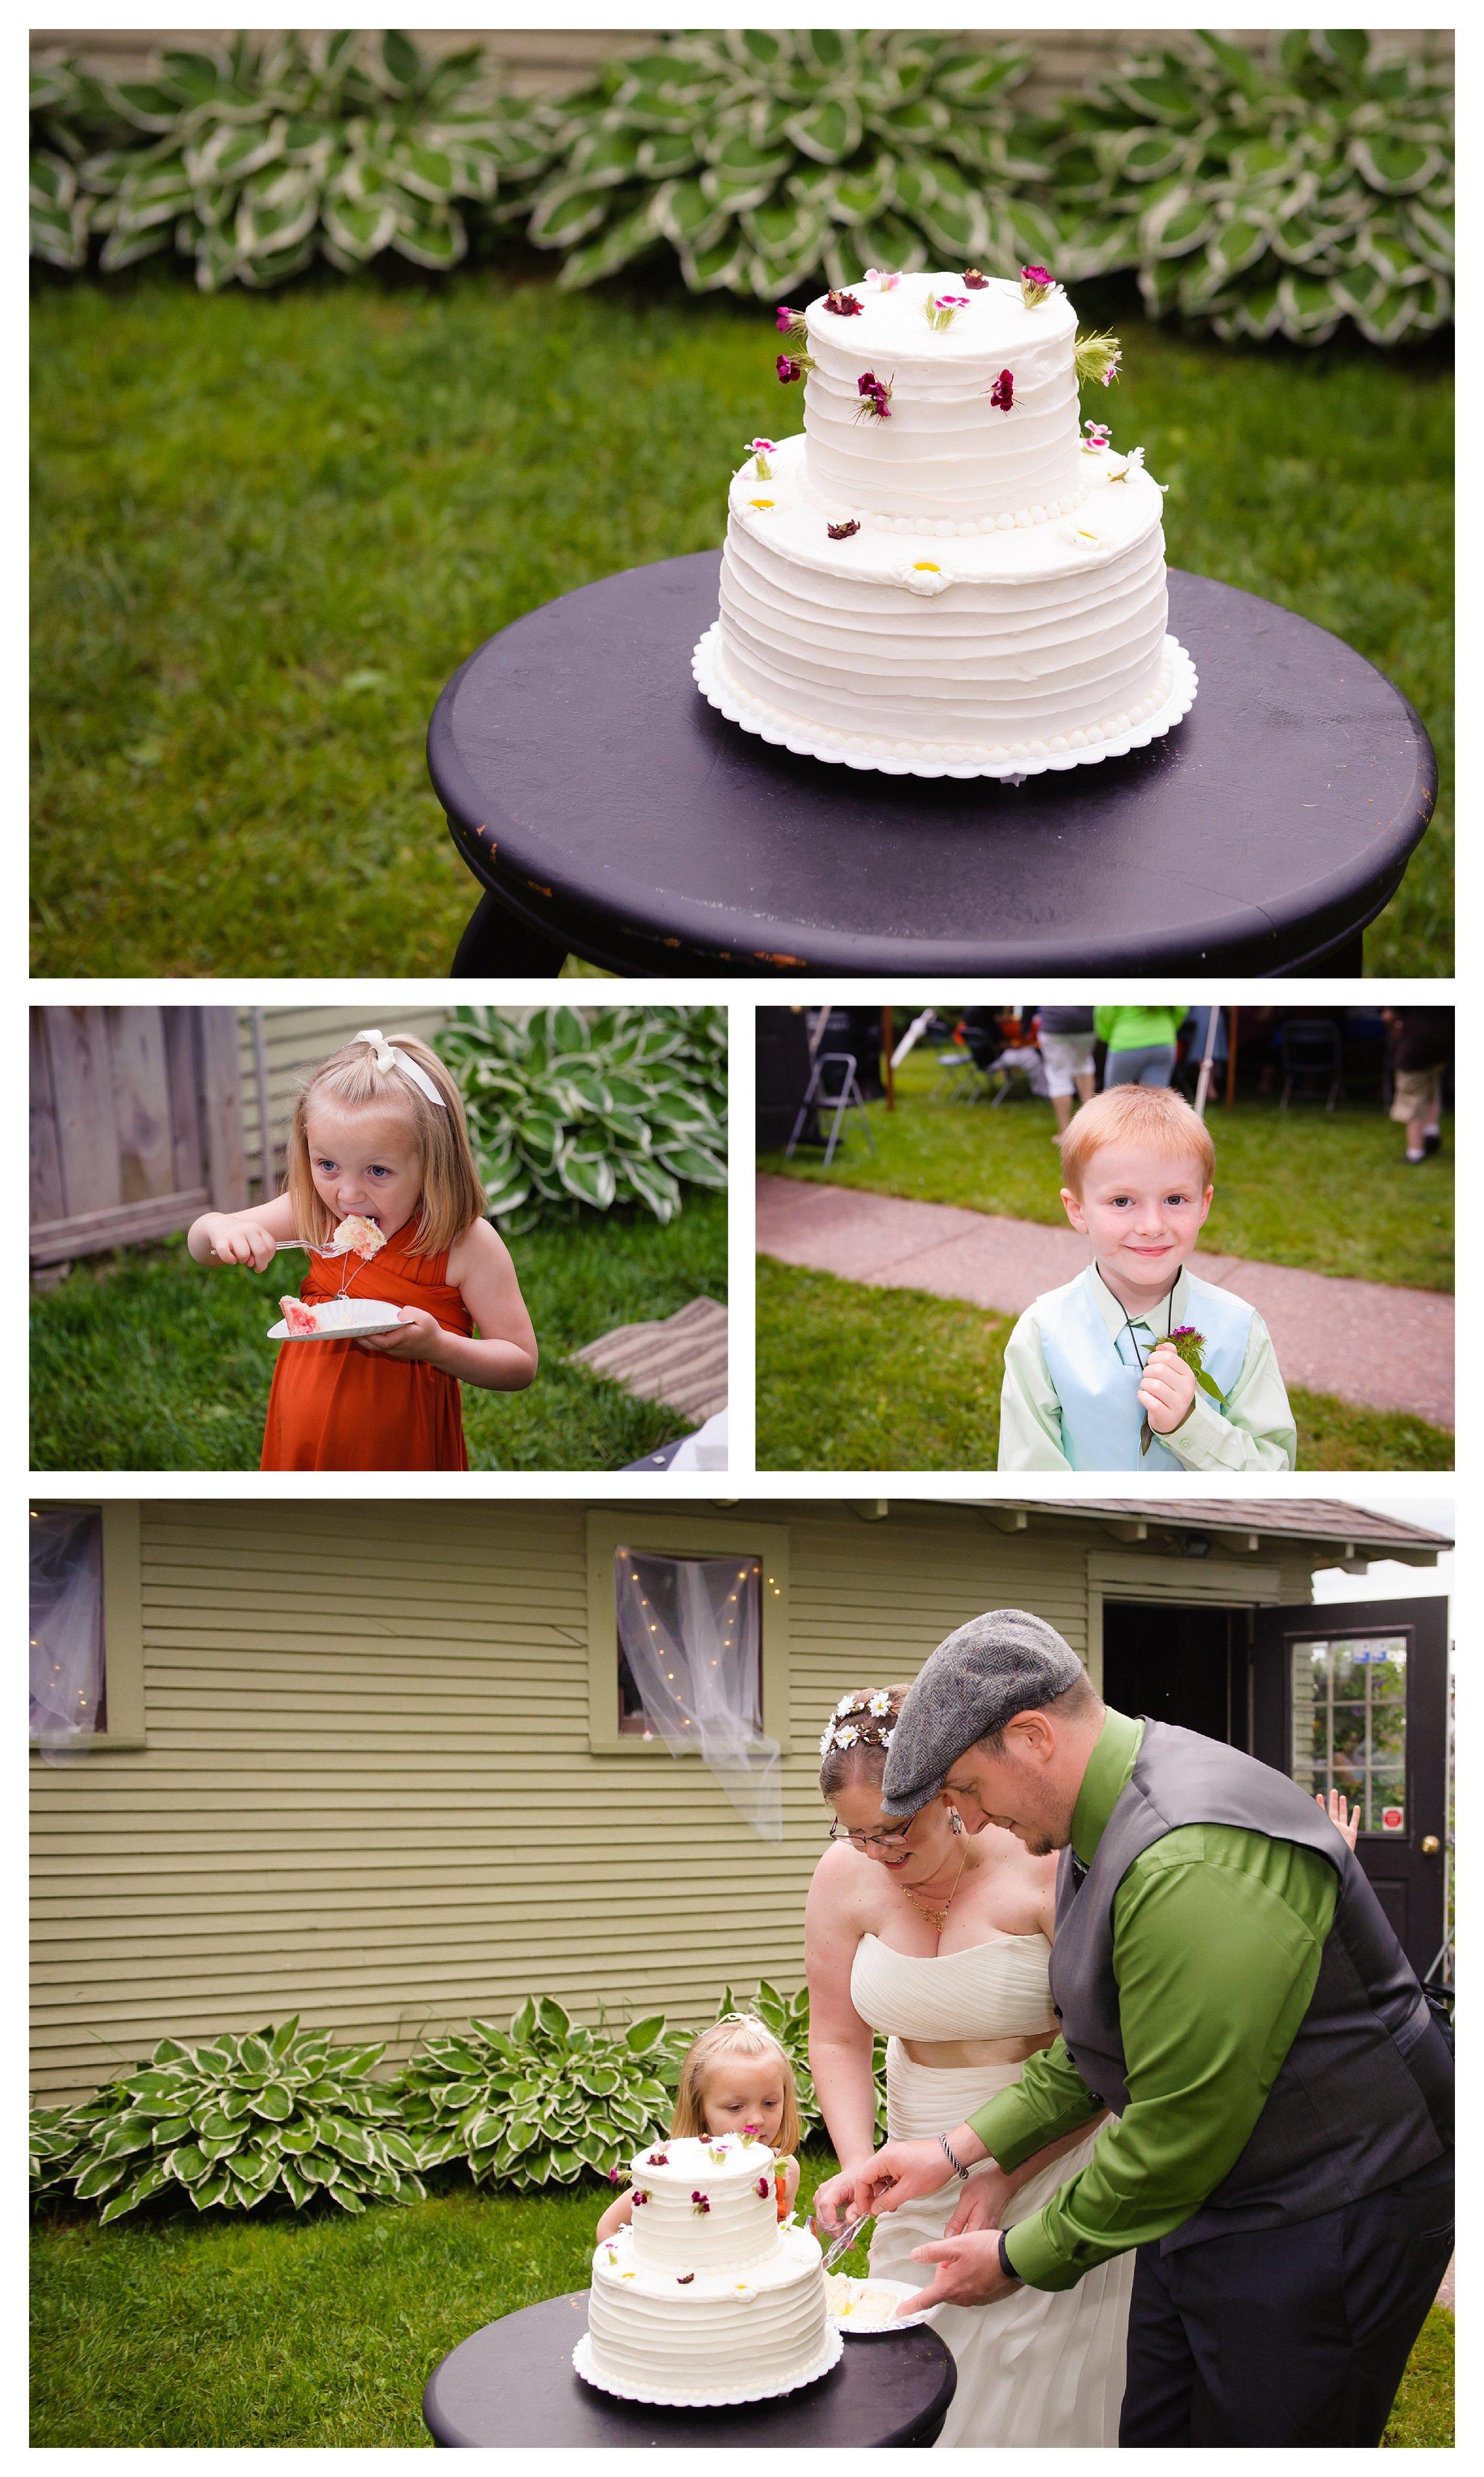 ashland oredock northwoods wisconsin wedding ps 139 photography_0302.jpg